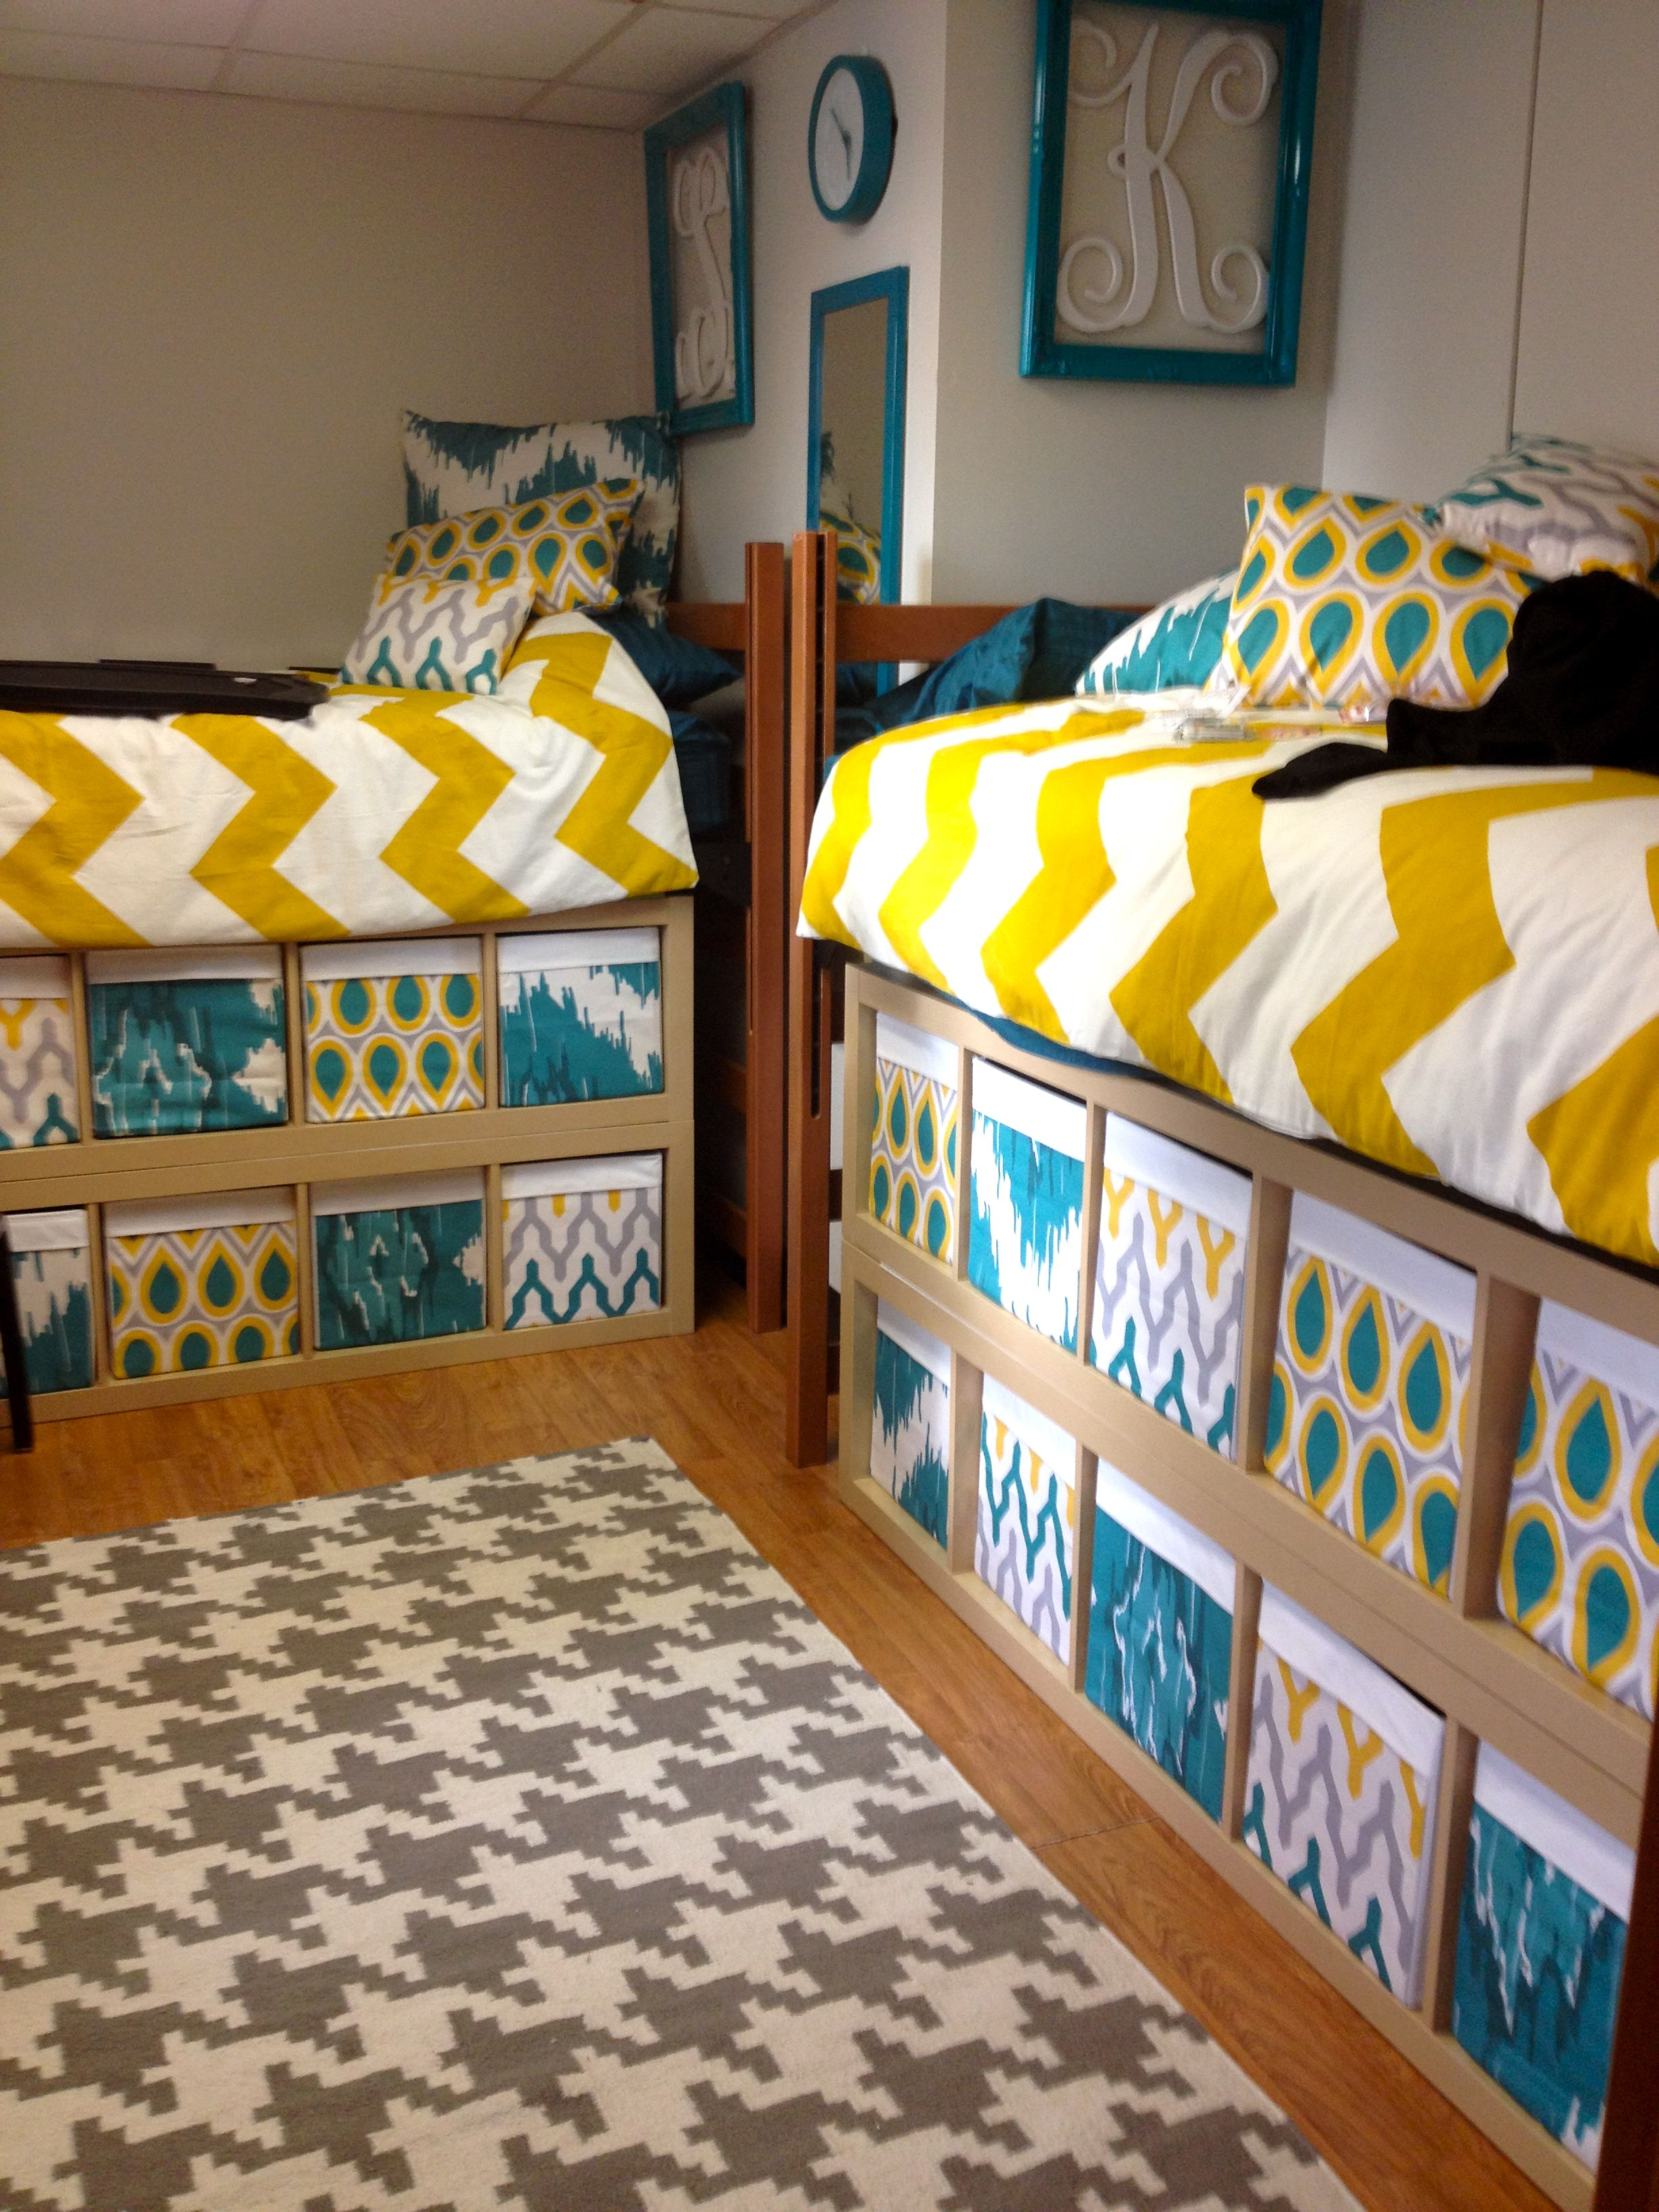 College dorm loft bed ideas  Dorm Room Ideas  Dorm Dorm room and Storage